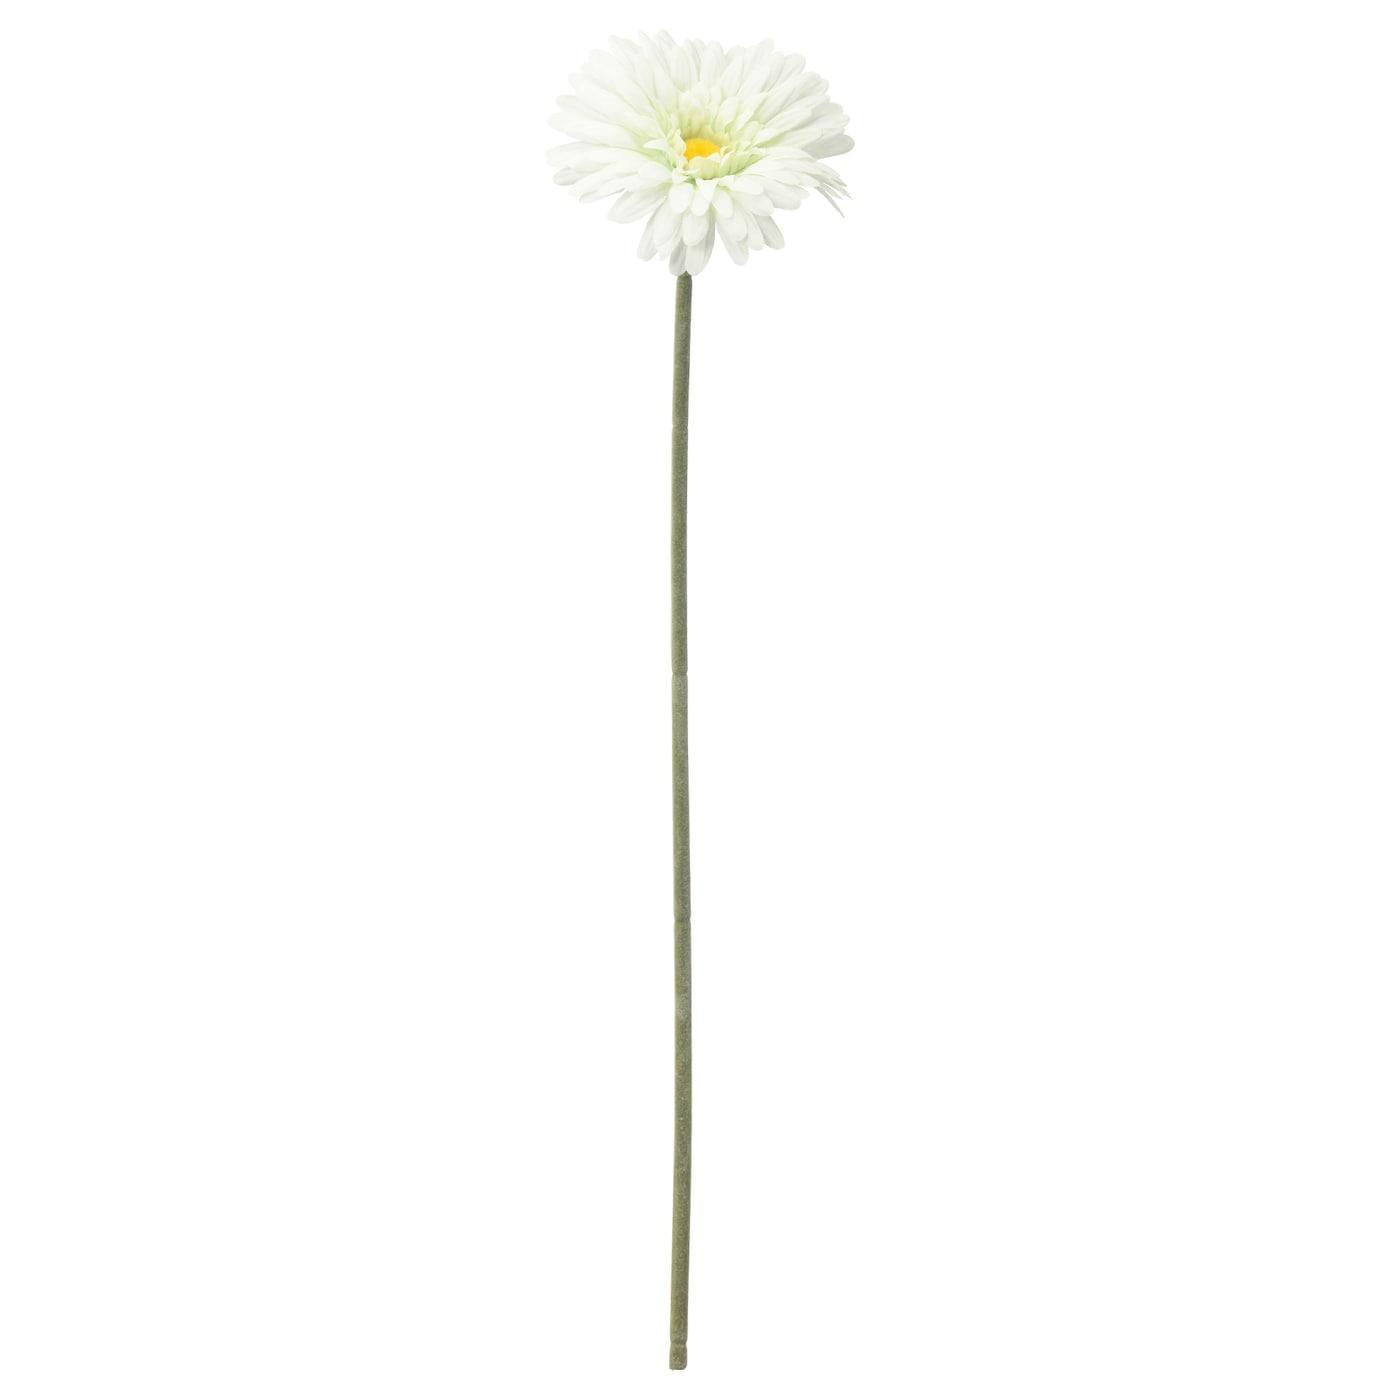 smycka fleur artificielle gerbera blanc 50 cm ikea. Black Bedroom Furniture Sets. Home Design Ideas